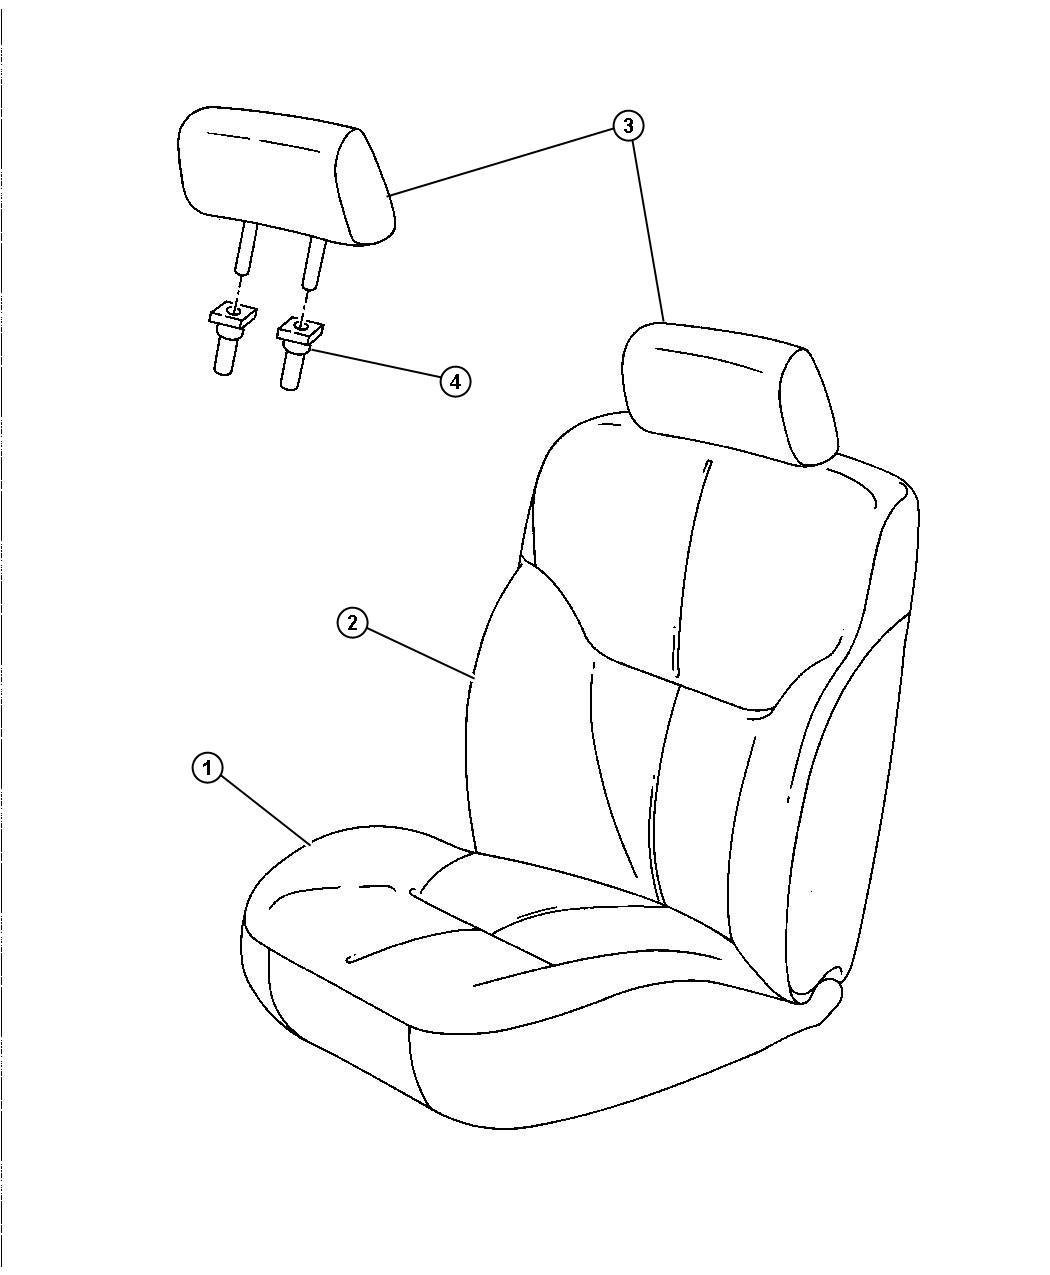 Dodge Stratus Headrest Front T5 Trim Seat